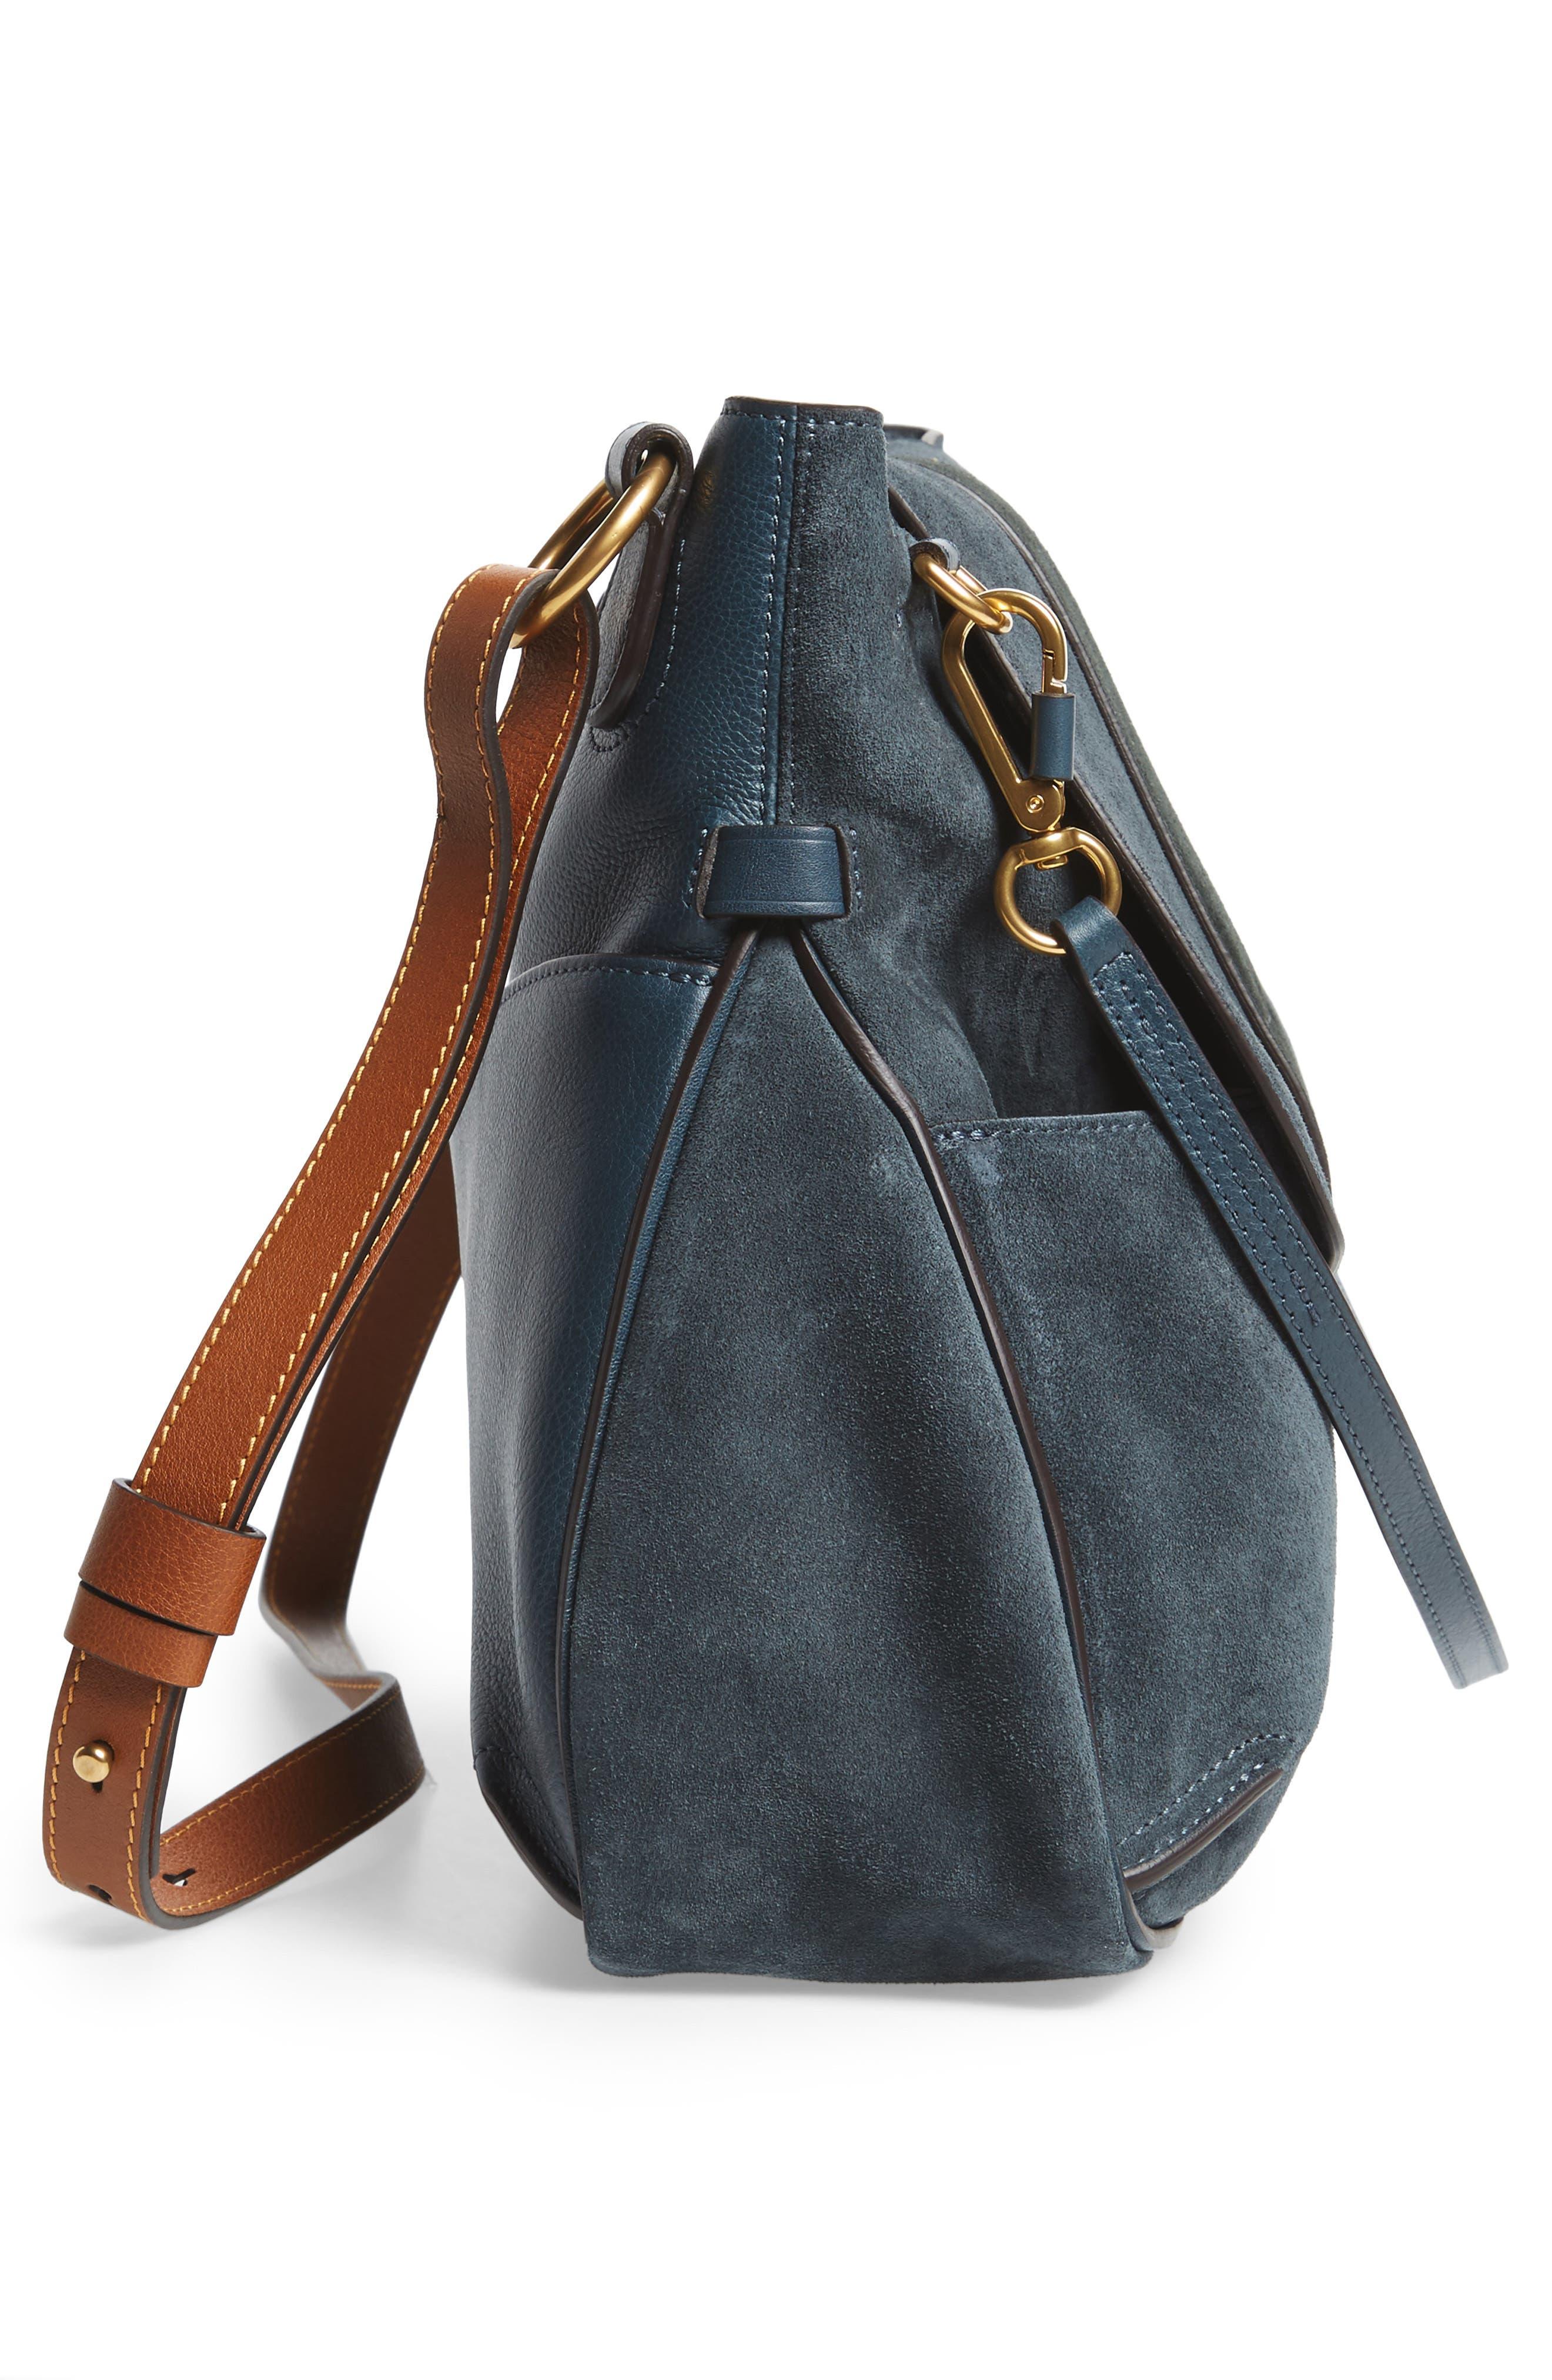 Medium Lexa Leather Shoulder Bag,                             Alternate thumbnail 9, color,